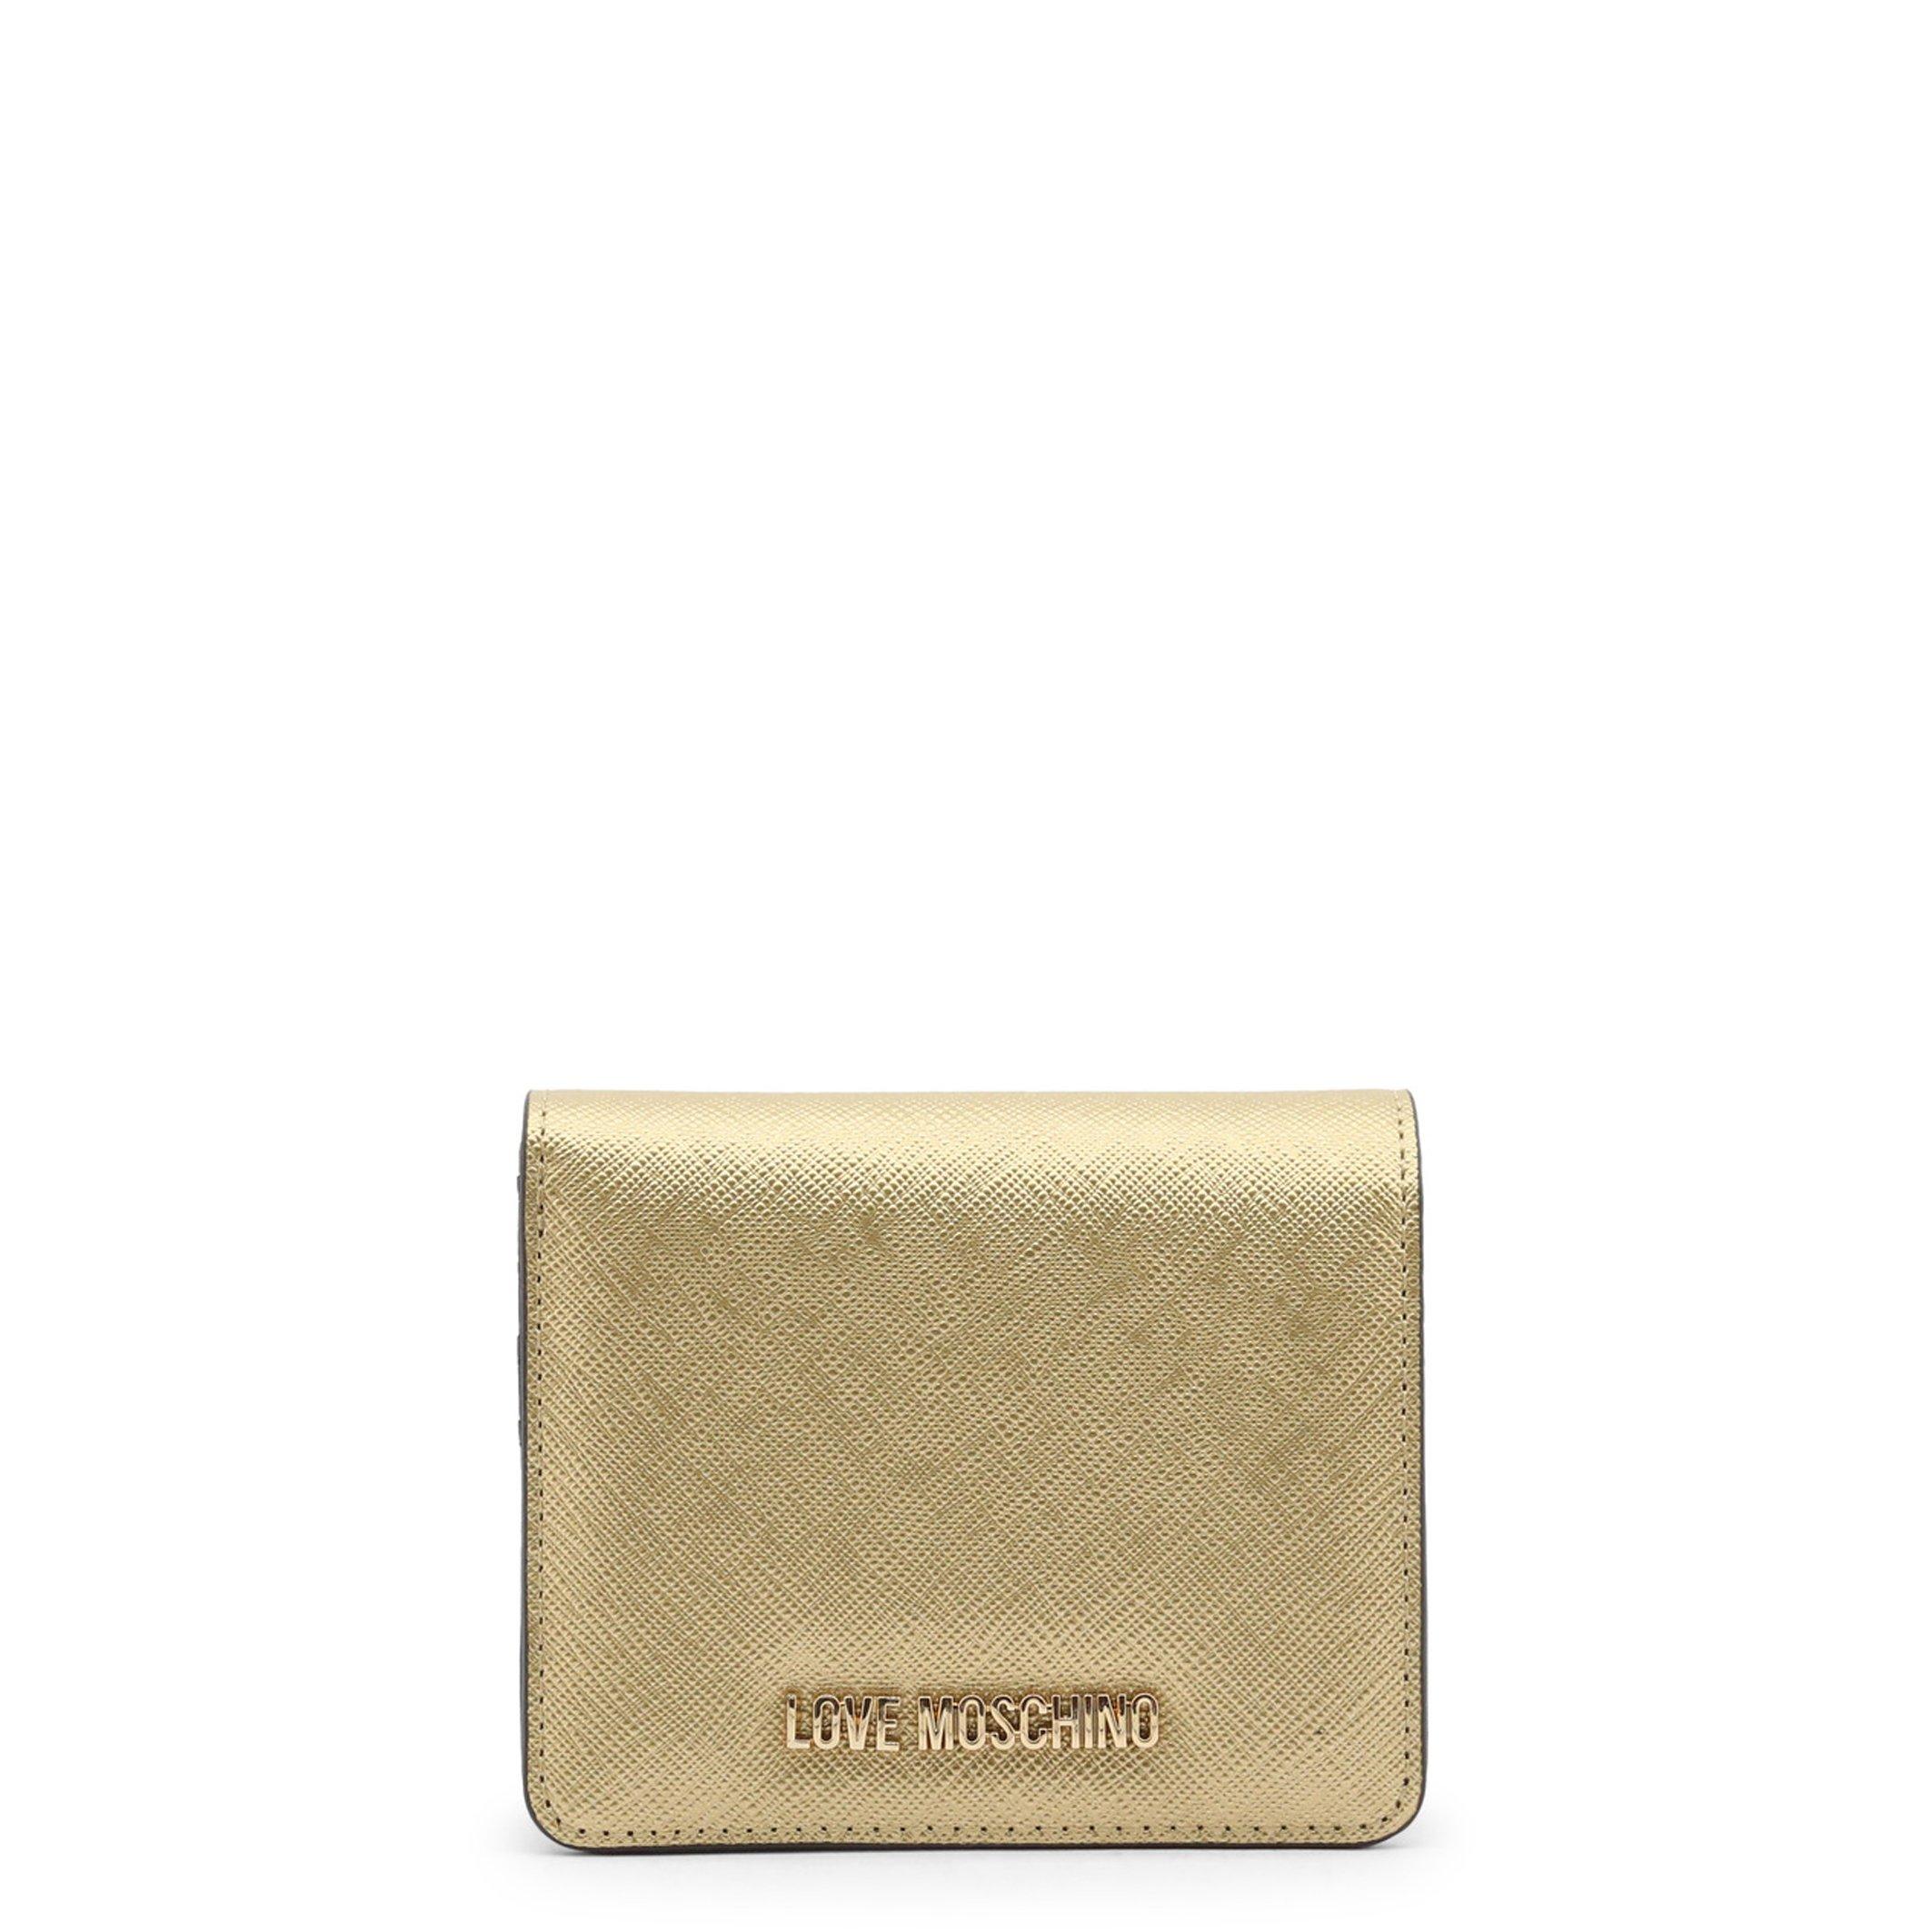 Love Moschino Women's Wallet Various Colours JC5562PP1ALQ0 - yellow NOSIZE